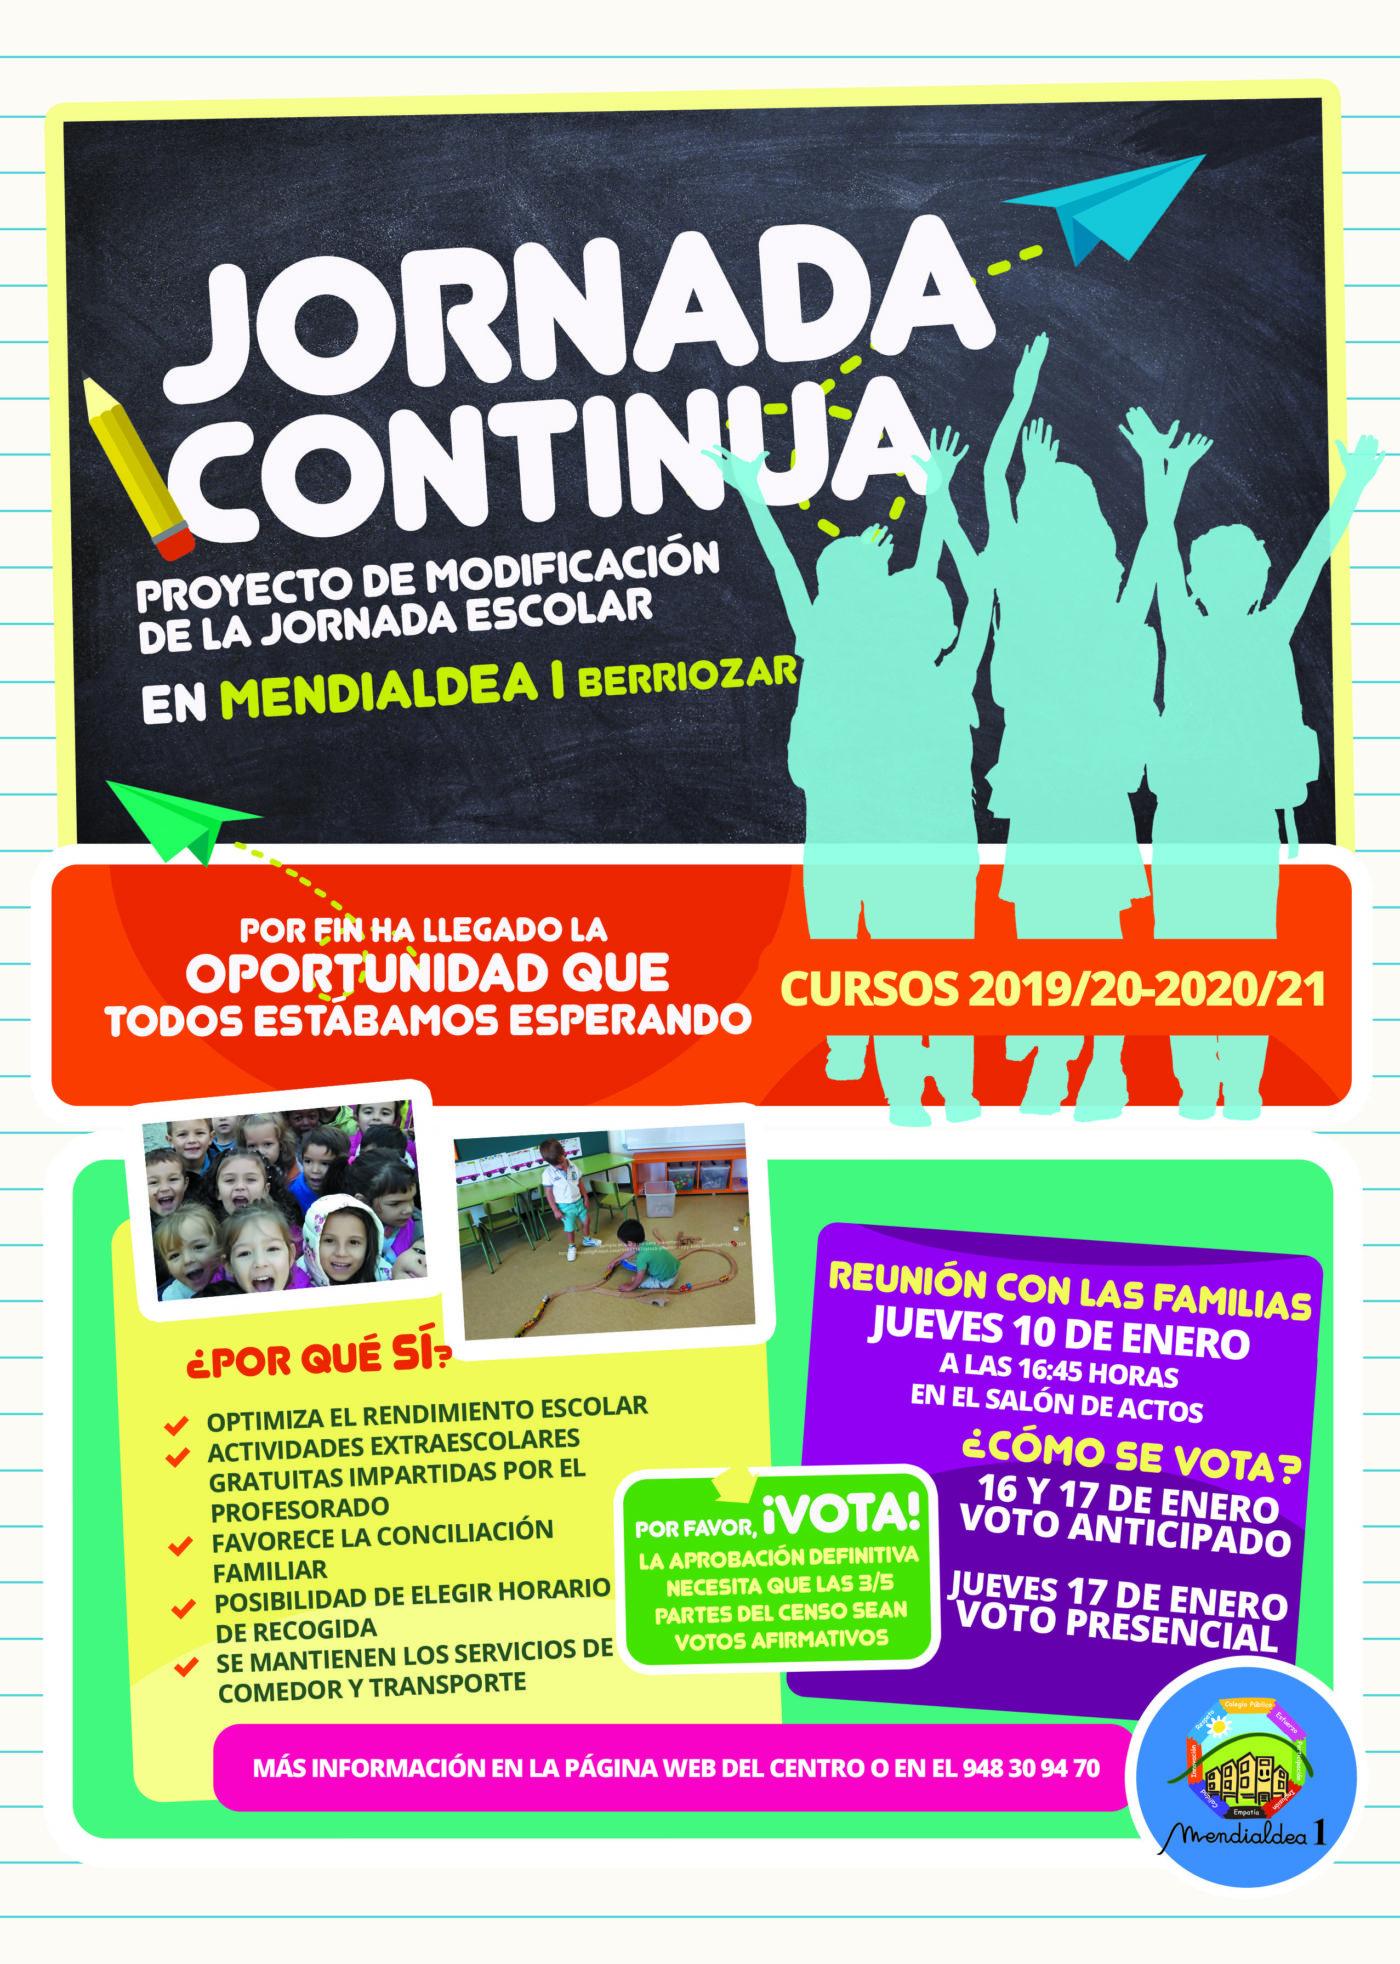 JORNADA CONTINUA 2019